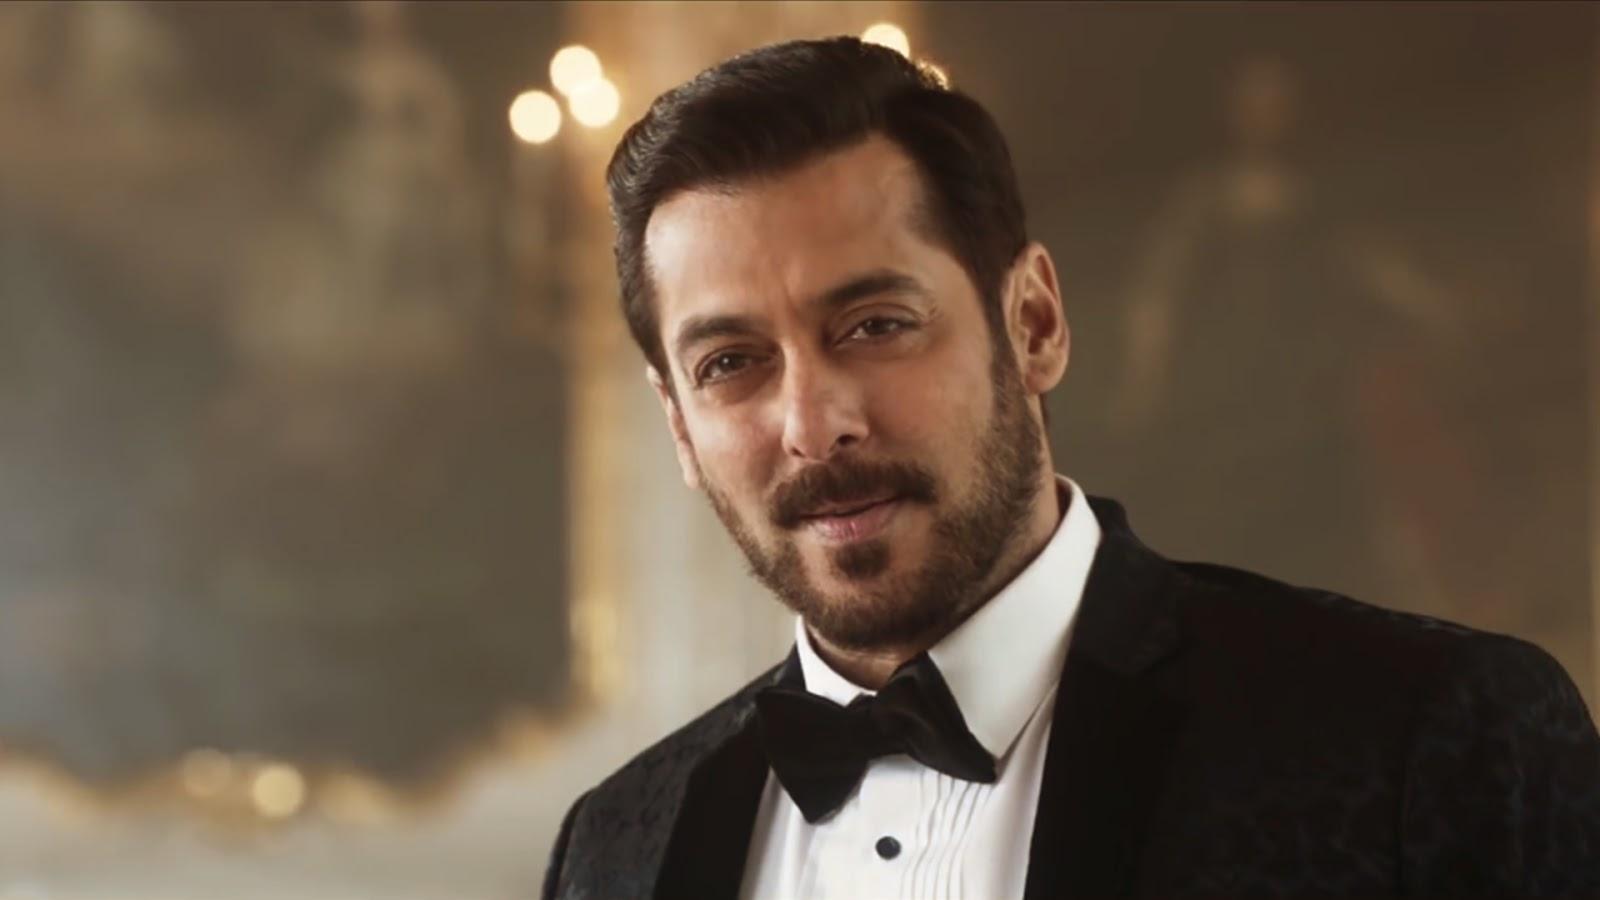 Salman Khan Hd Wallpapers From Song Dil Diyan Gallan Pop And Top